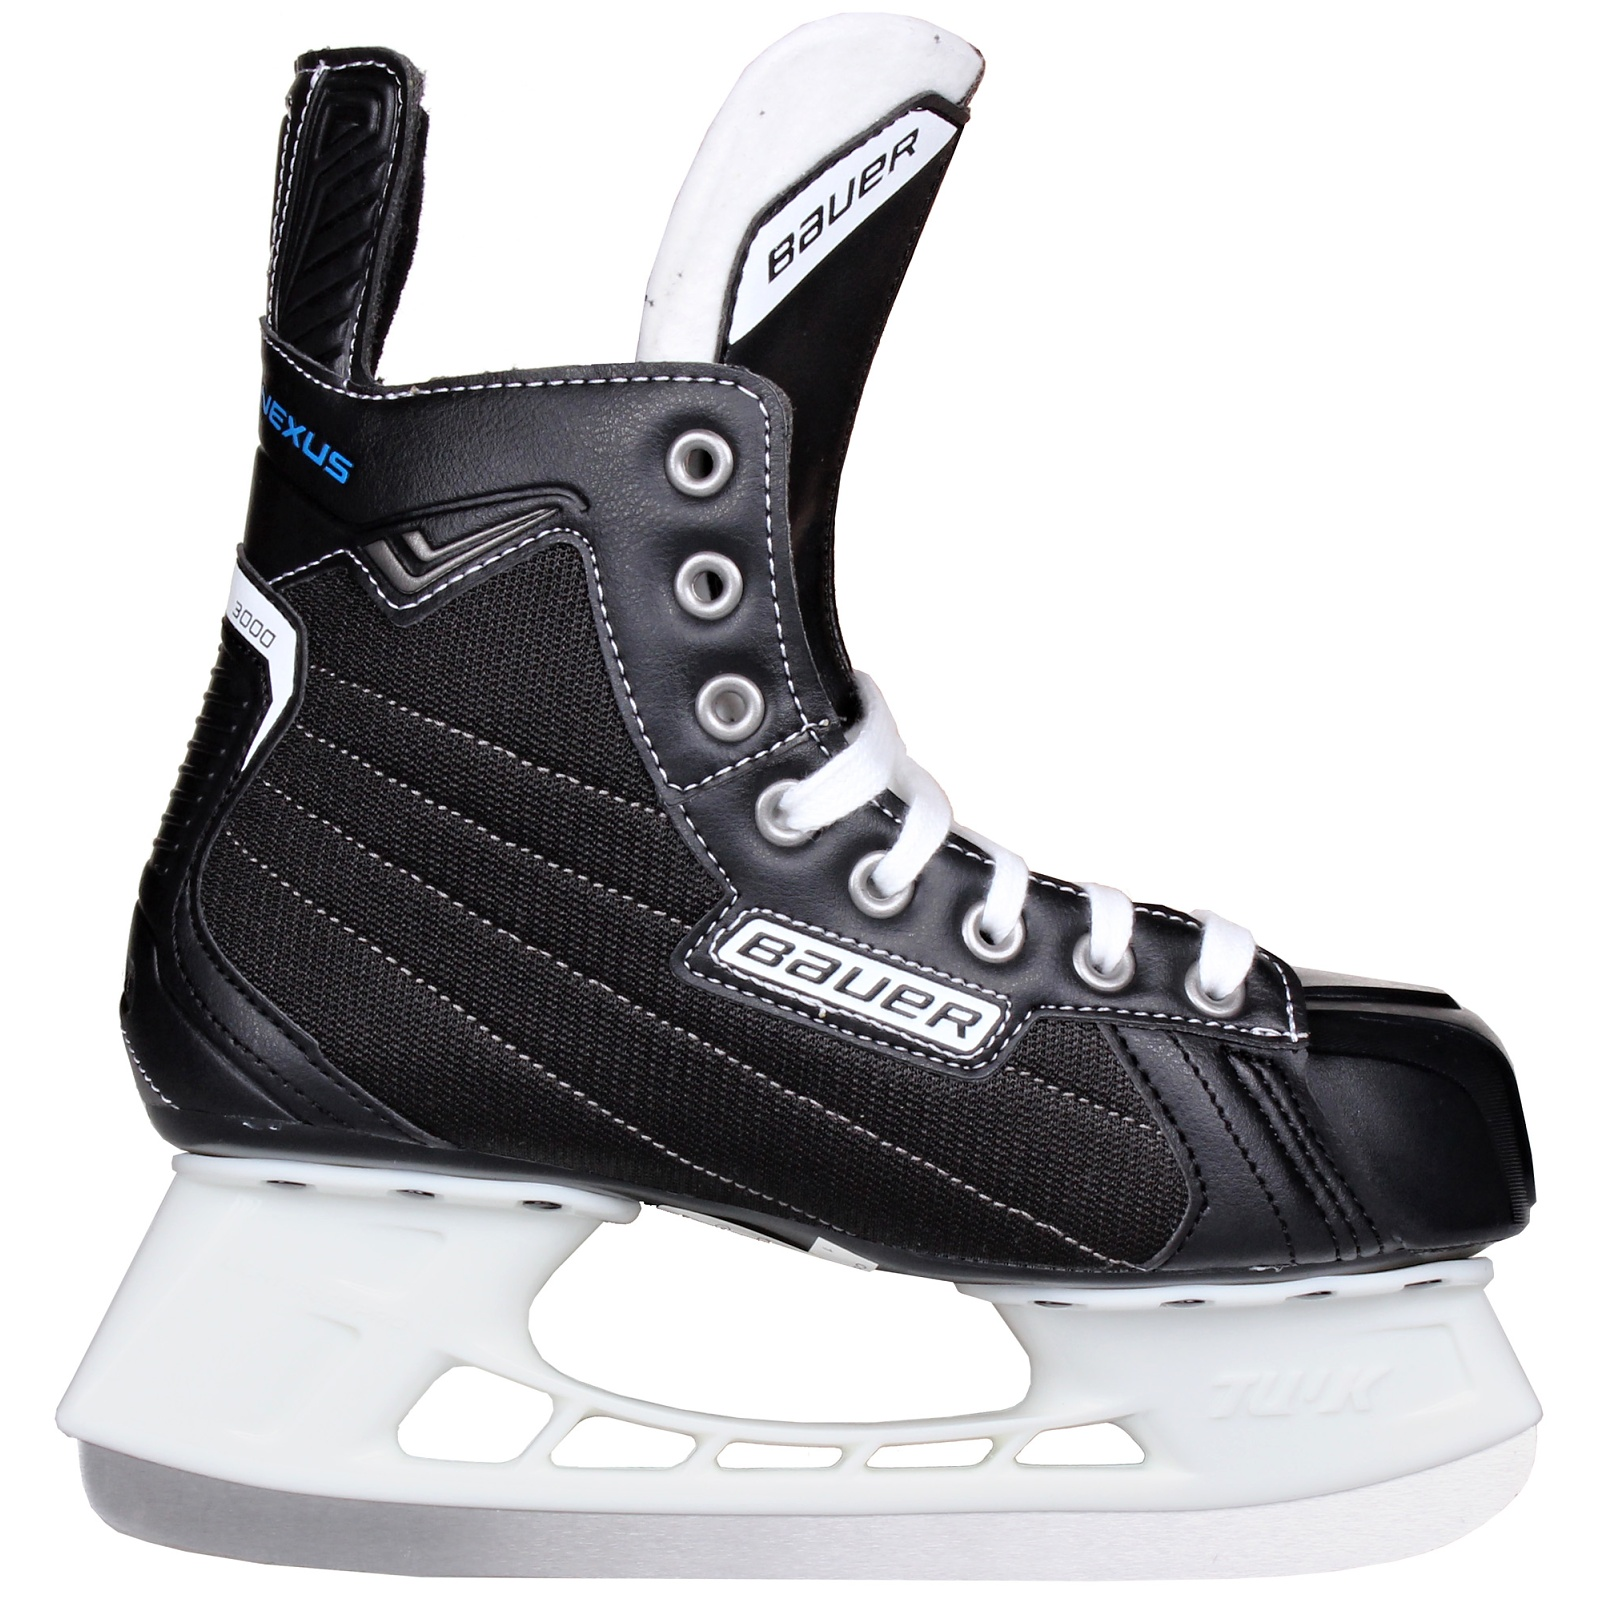 Hokejové brusle BAUER Nexus 3000 junior - vel. 38,5